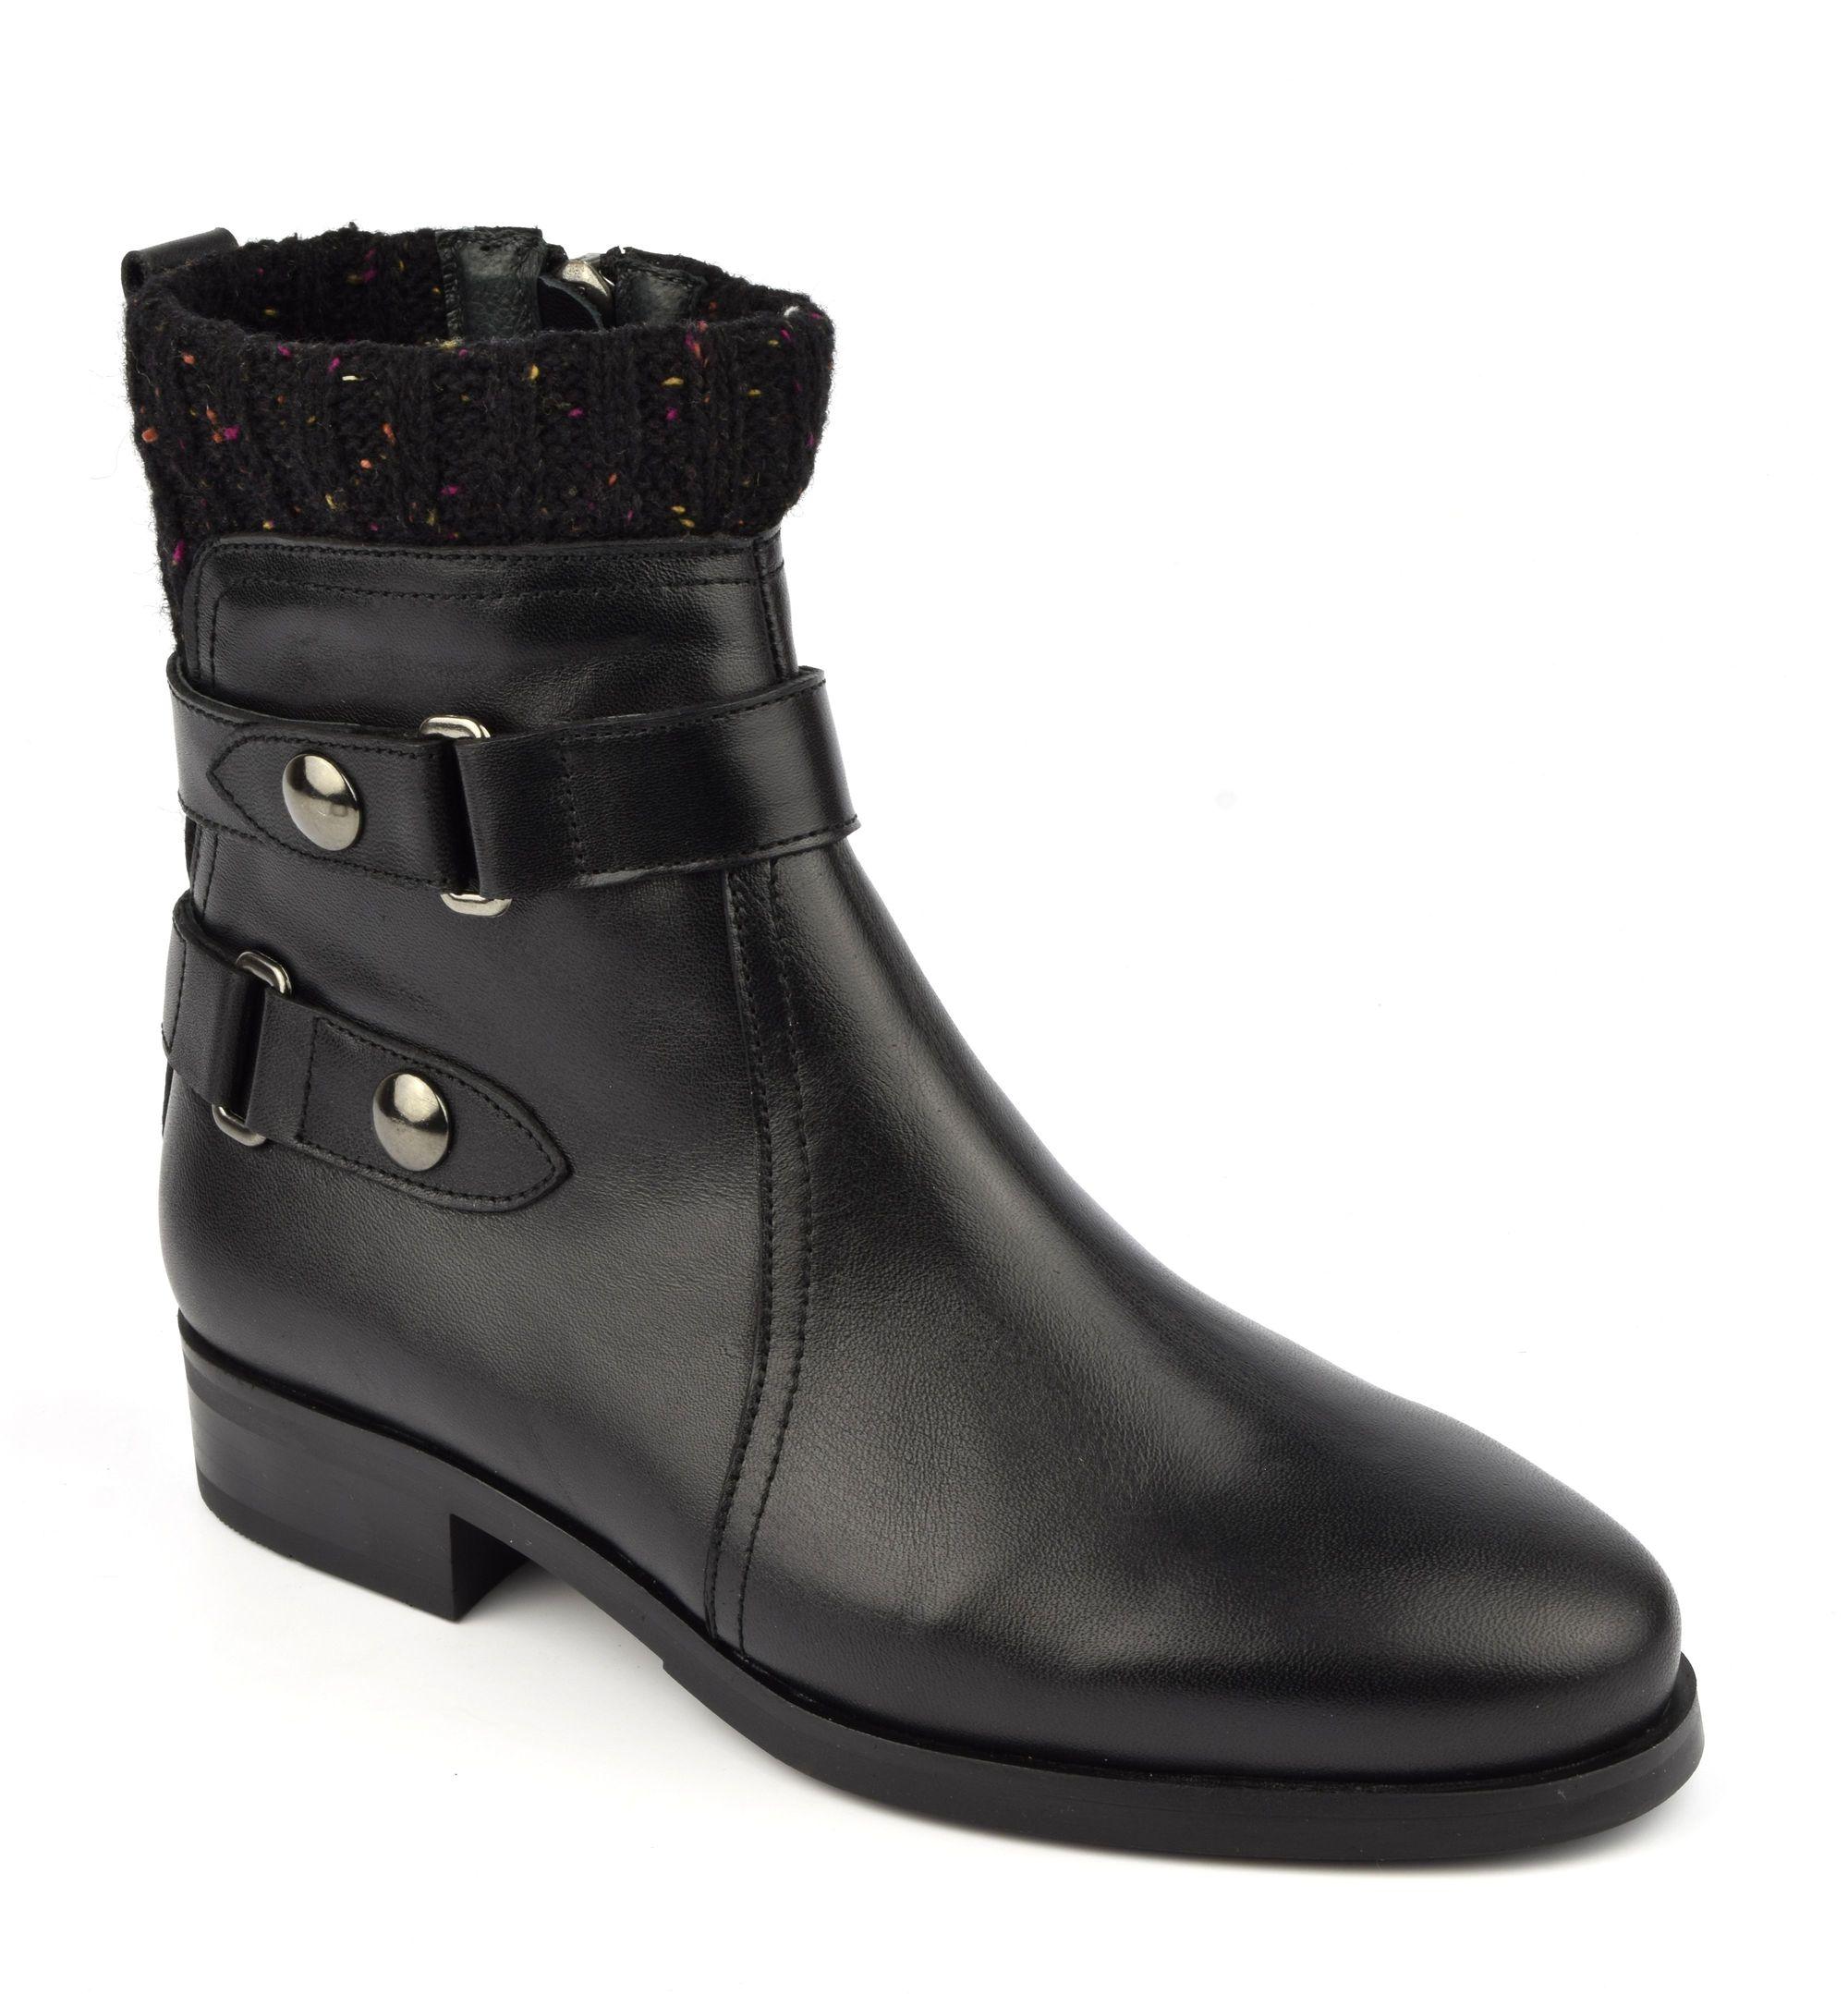 chaussures femme petite pointure